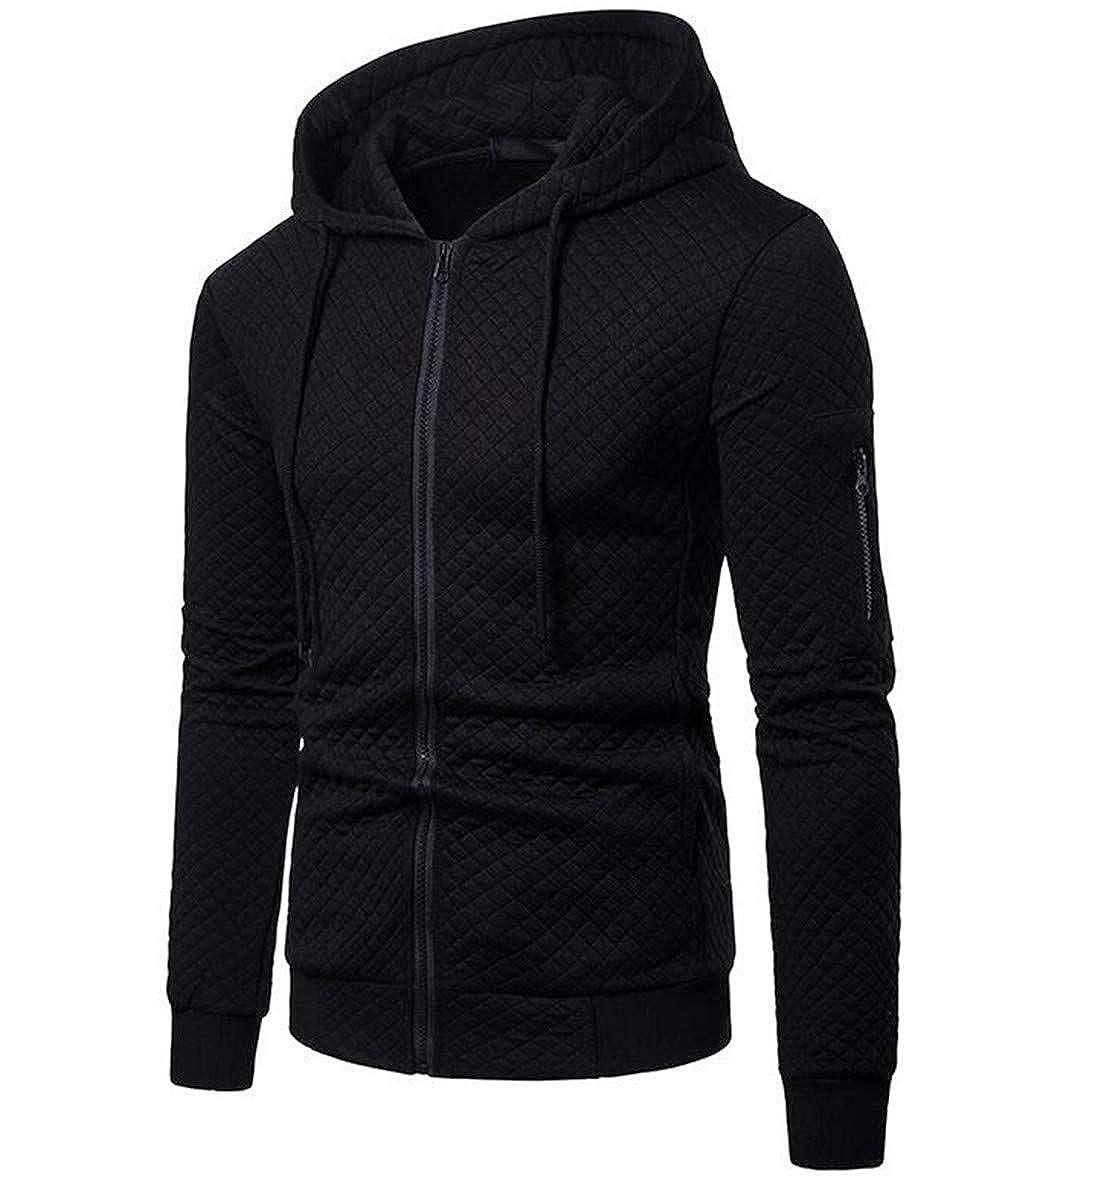 BU2H Men Winter Thicken Slim Fit Long Sleeve Zipper Hooded Jacket Coat